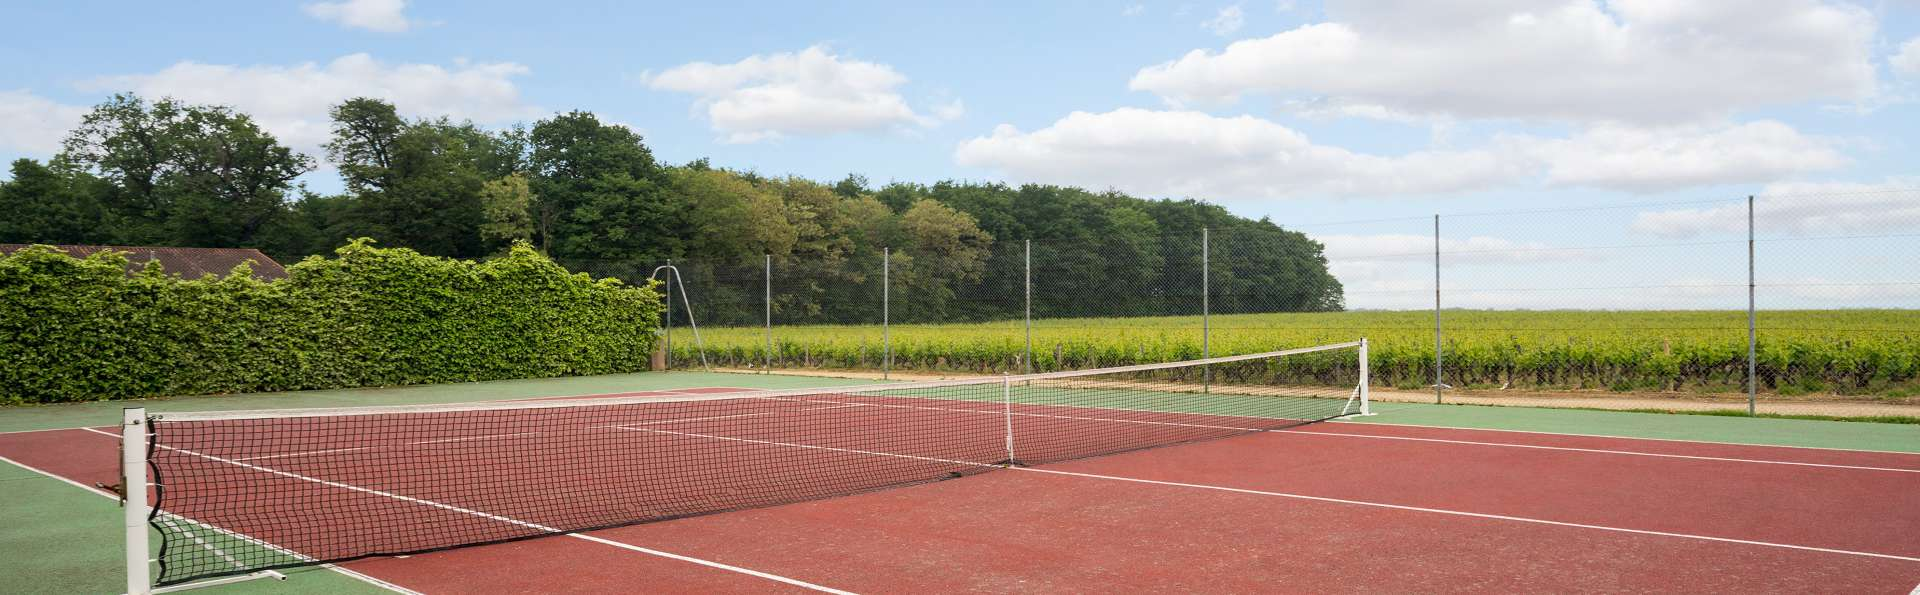 Château de Pizay  - EDIT_Tennis.jpg